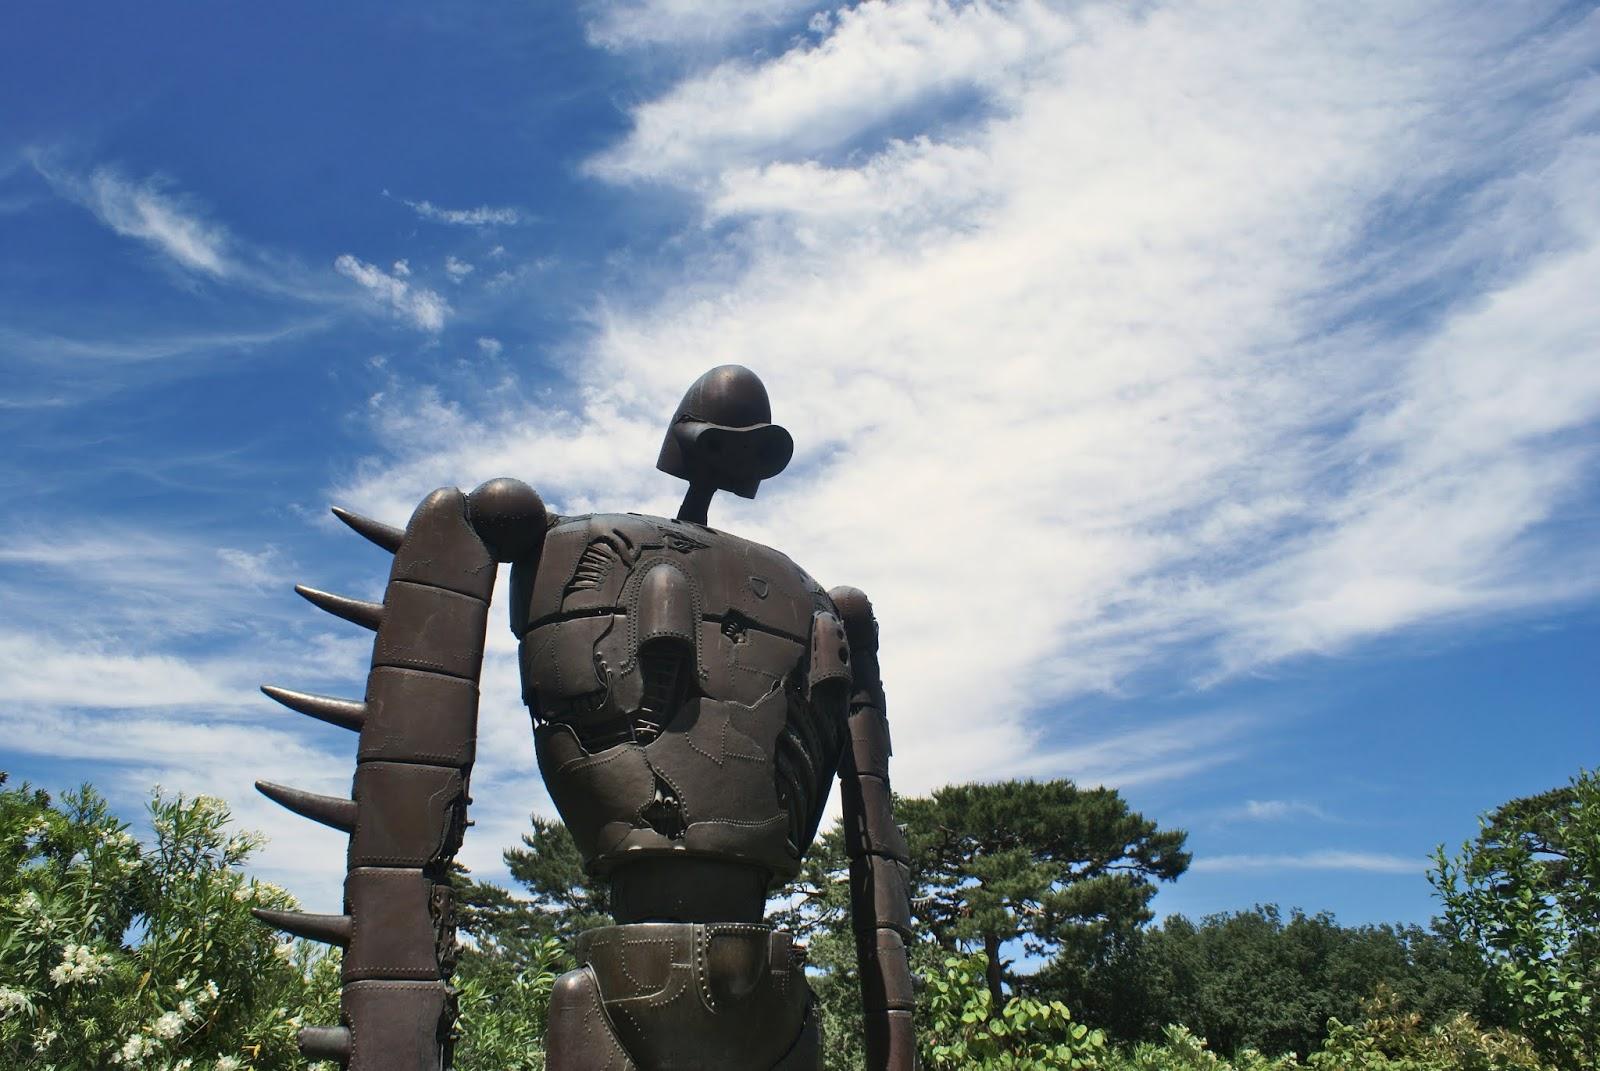 robot ghibli museum mitaka tokyo japan anime